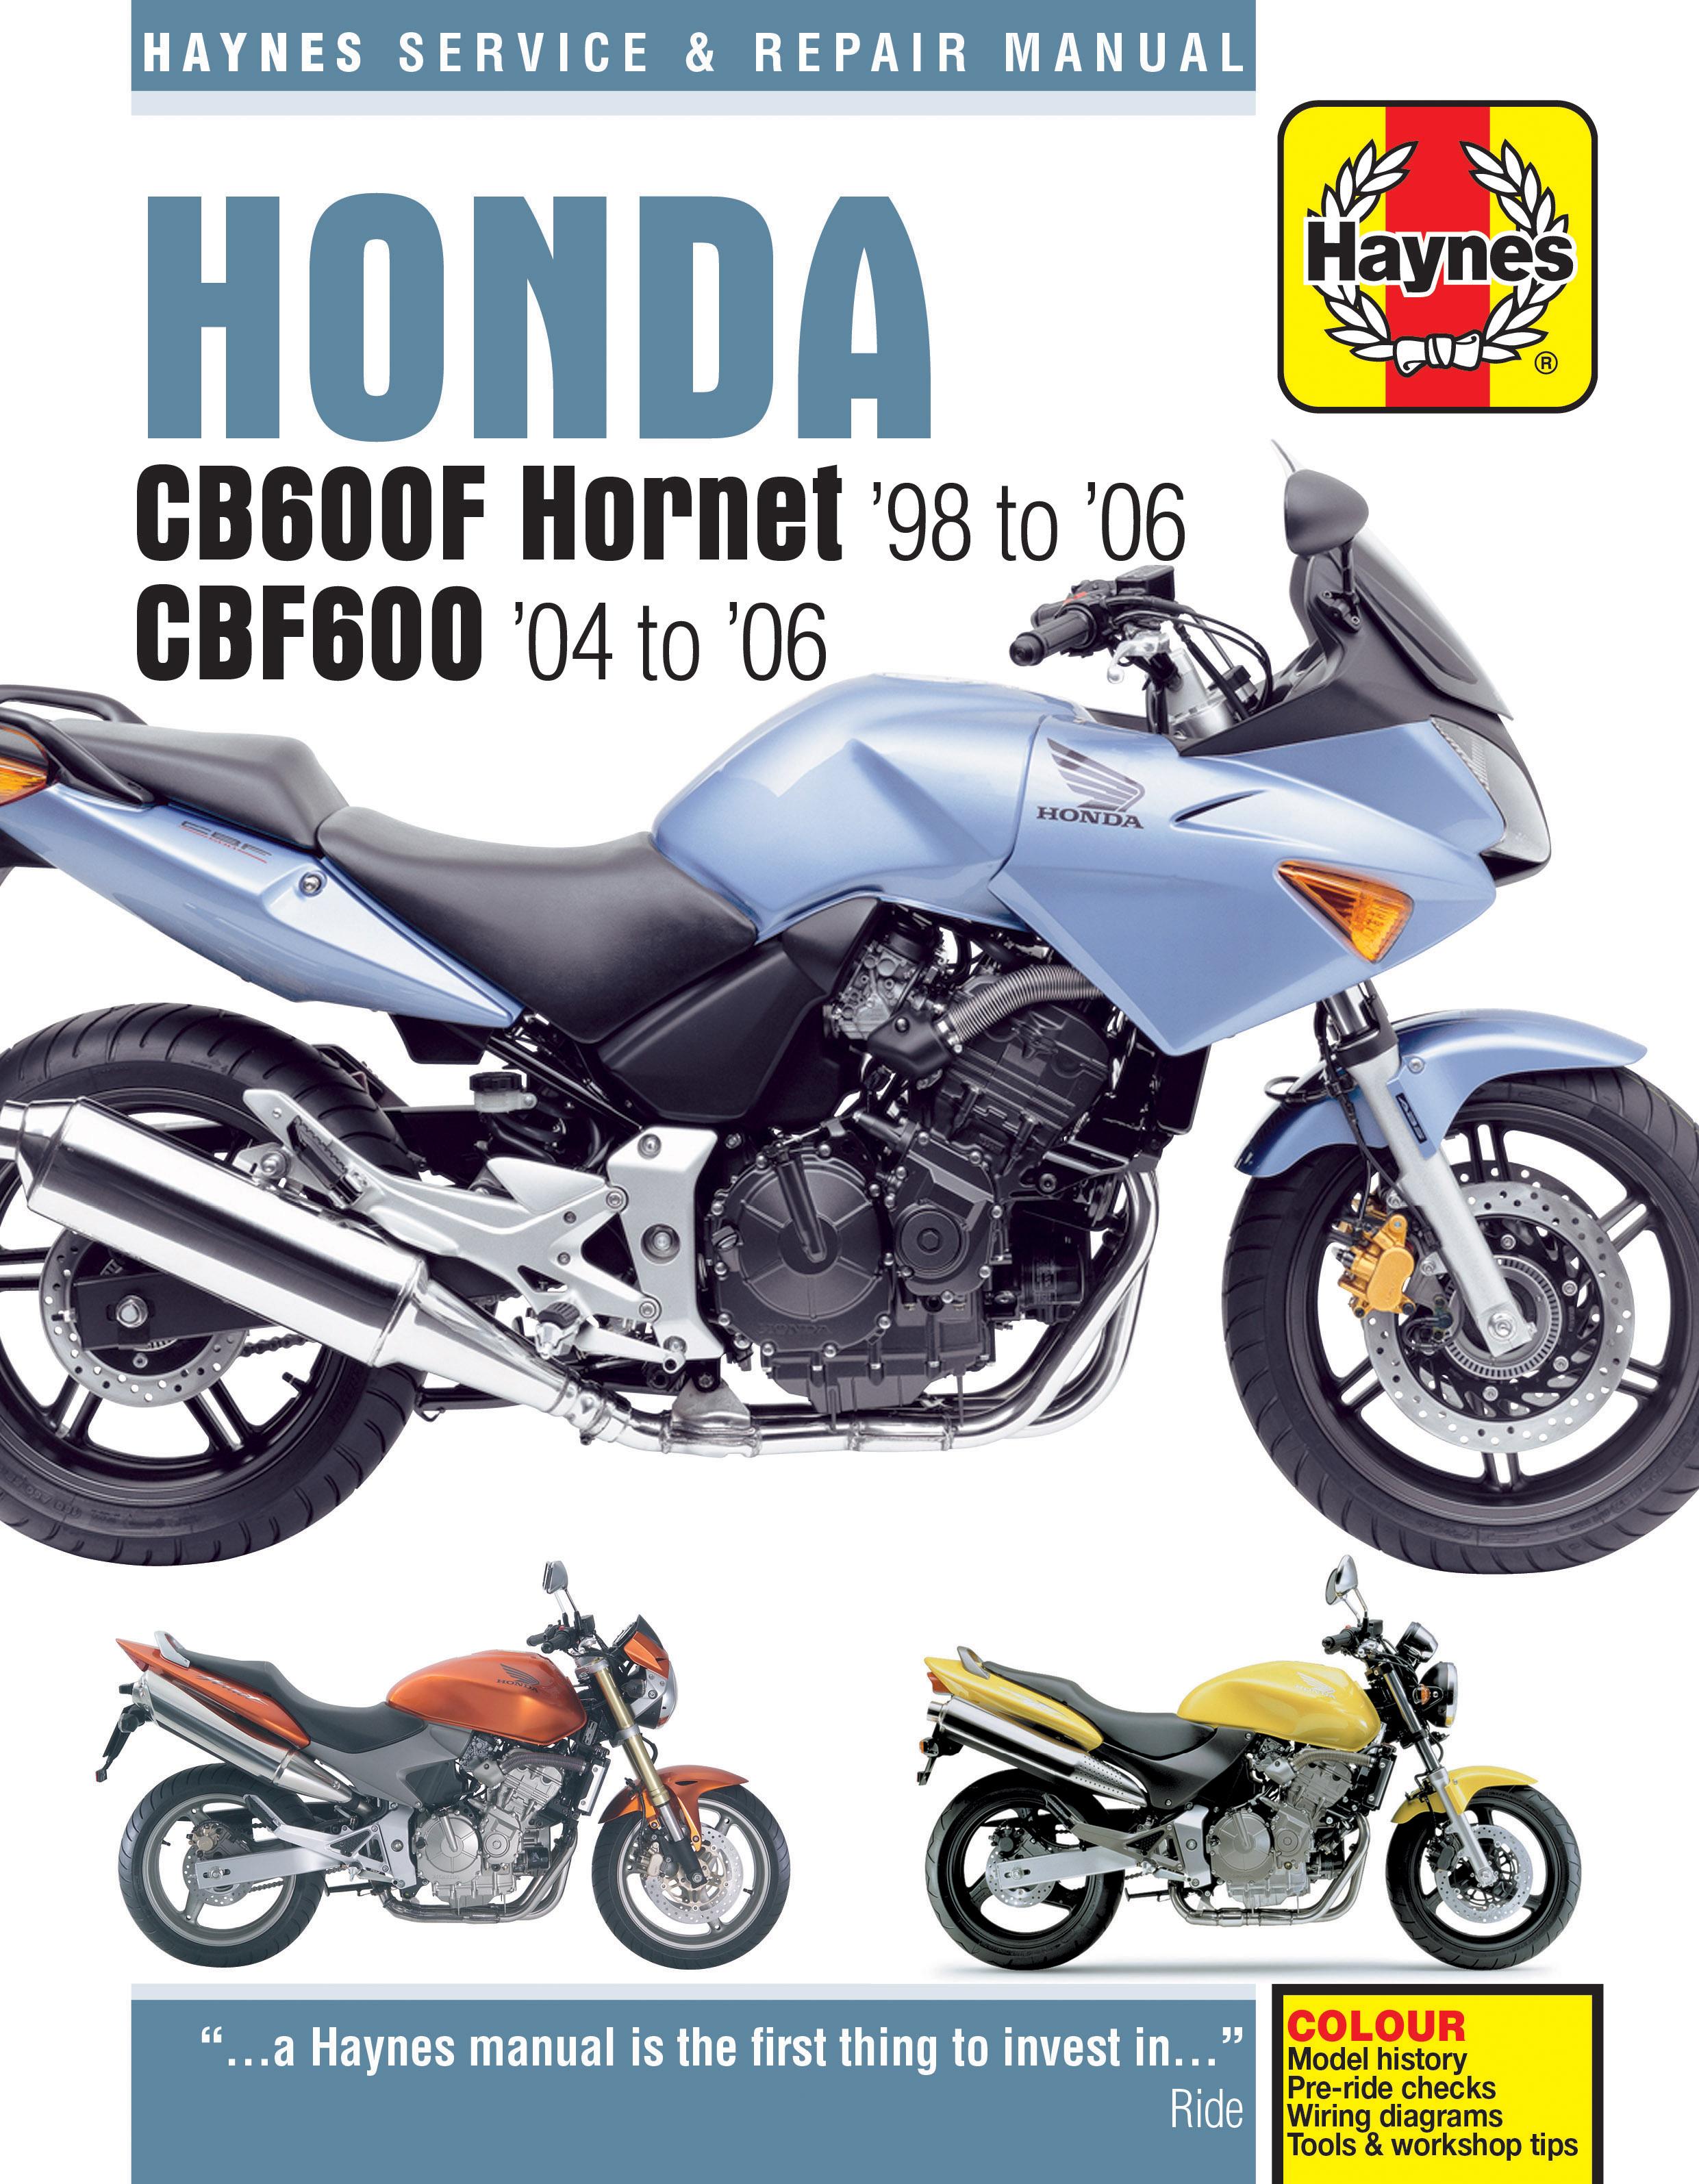 Honda Hornet Usa